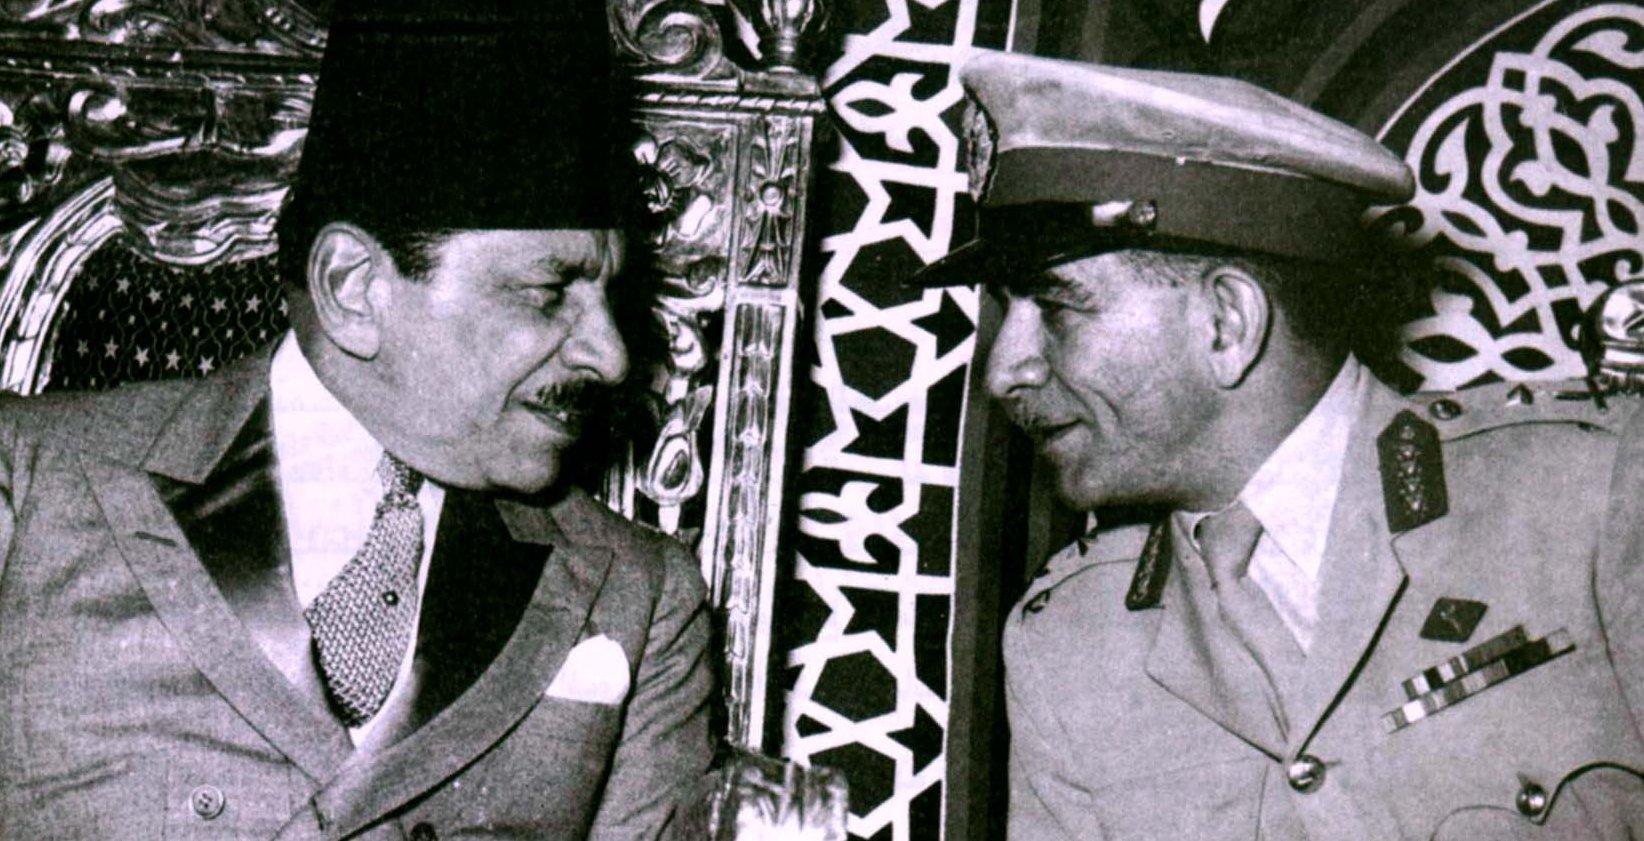 محمد نجيب و علي ماهر بعد 23 يوليو